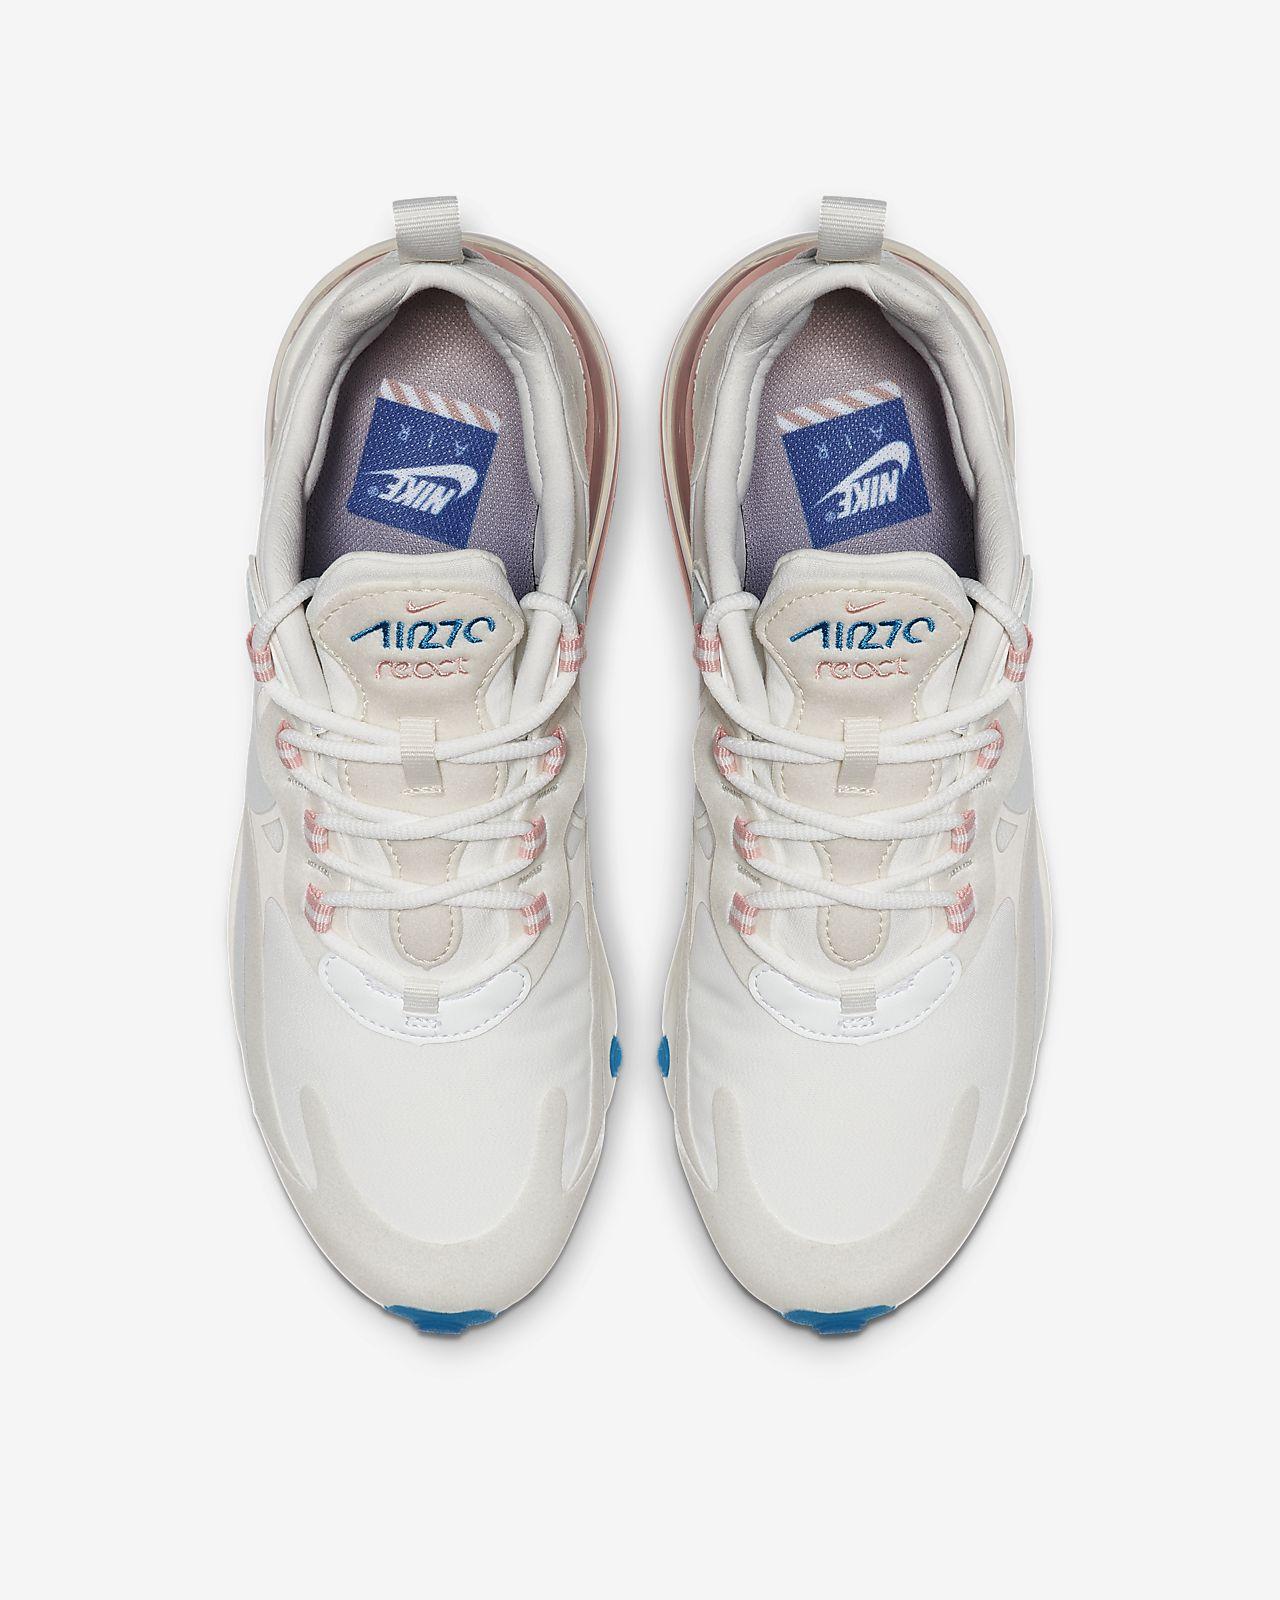 Nike American Modern Air Max 270 React Trainers